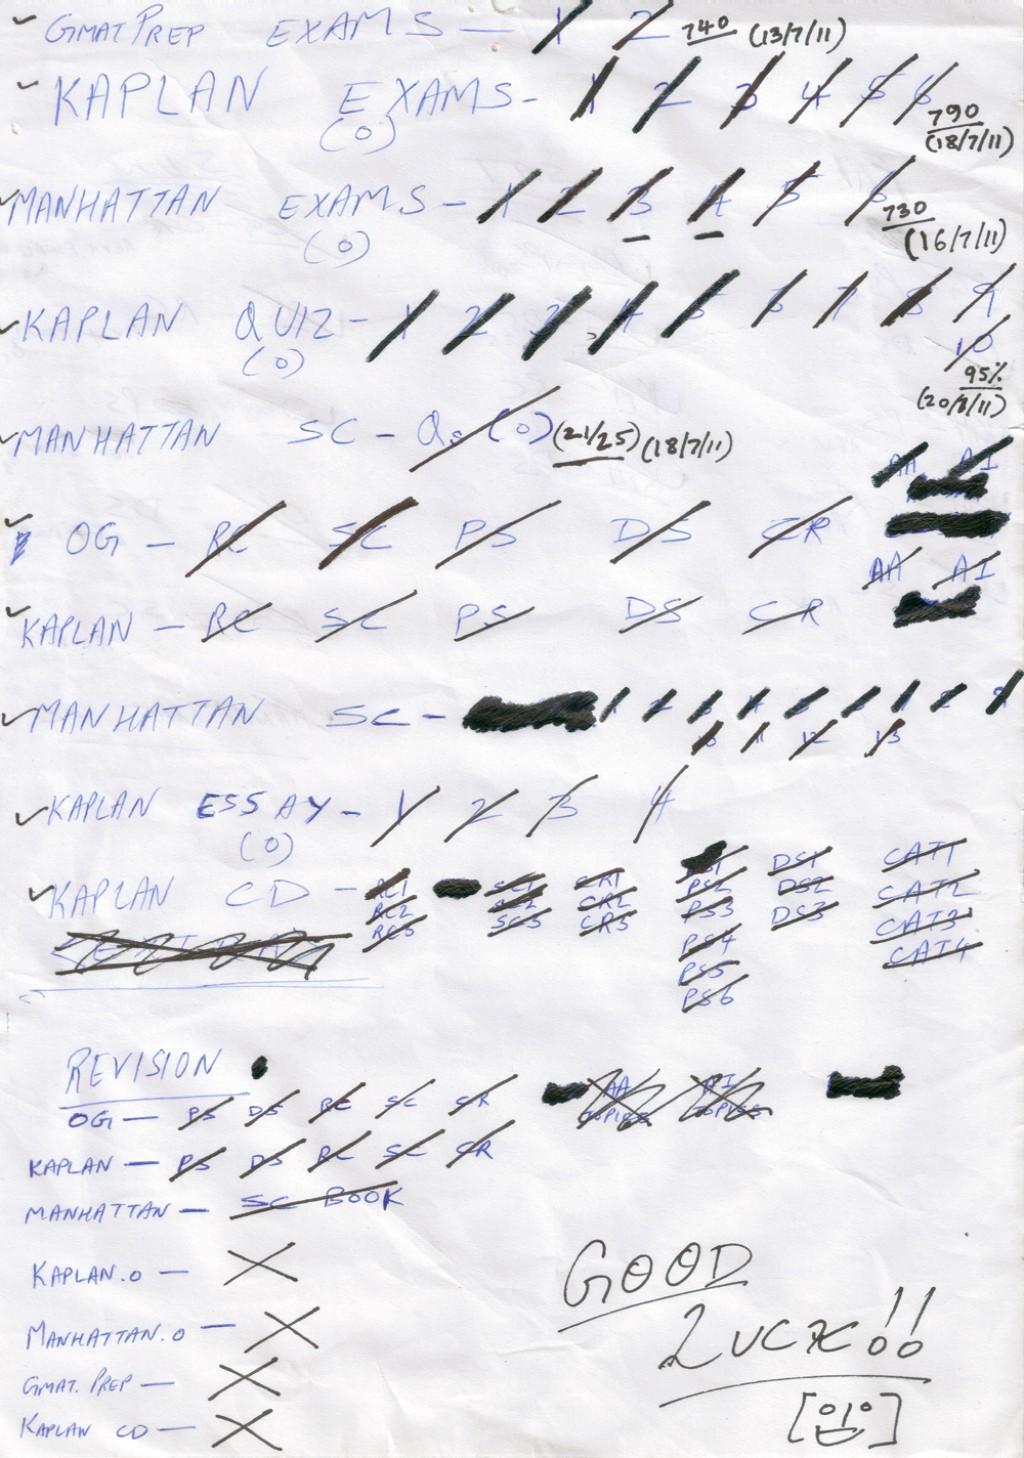 014 Gmat Prep List Essay Score Archaicawful Awa 6 Calculator Large